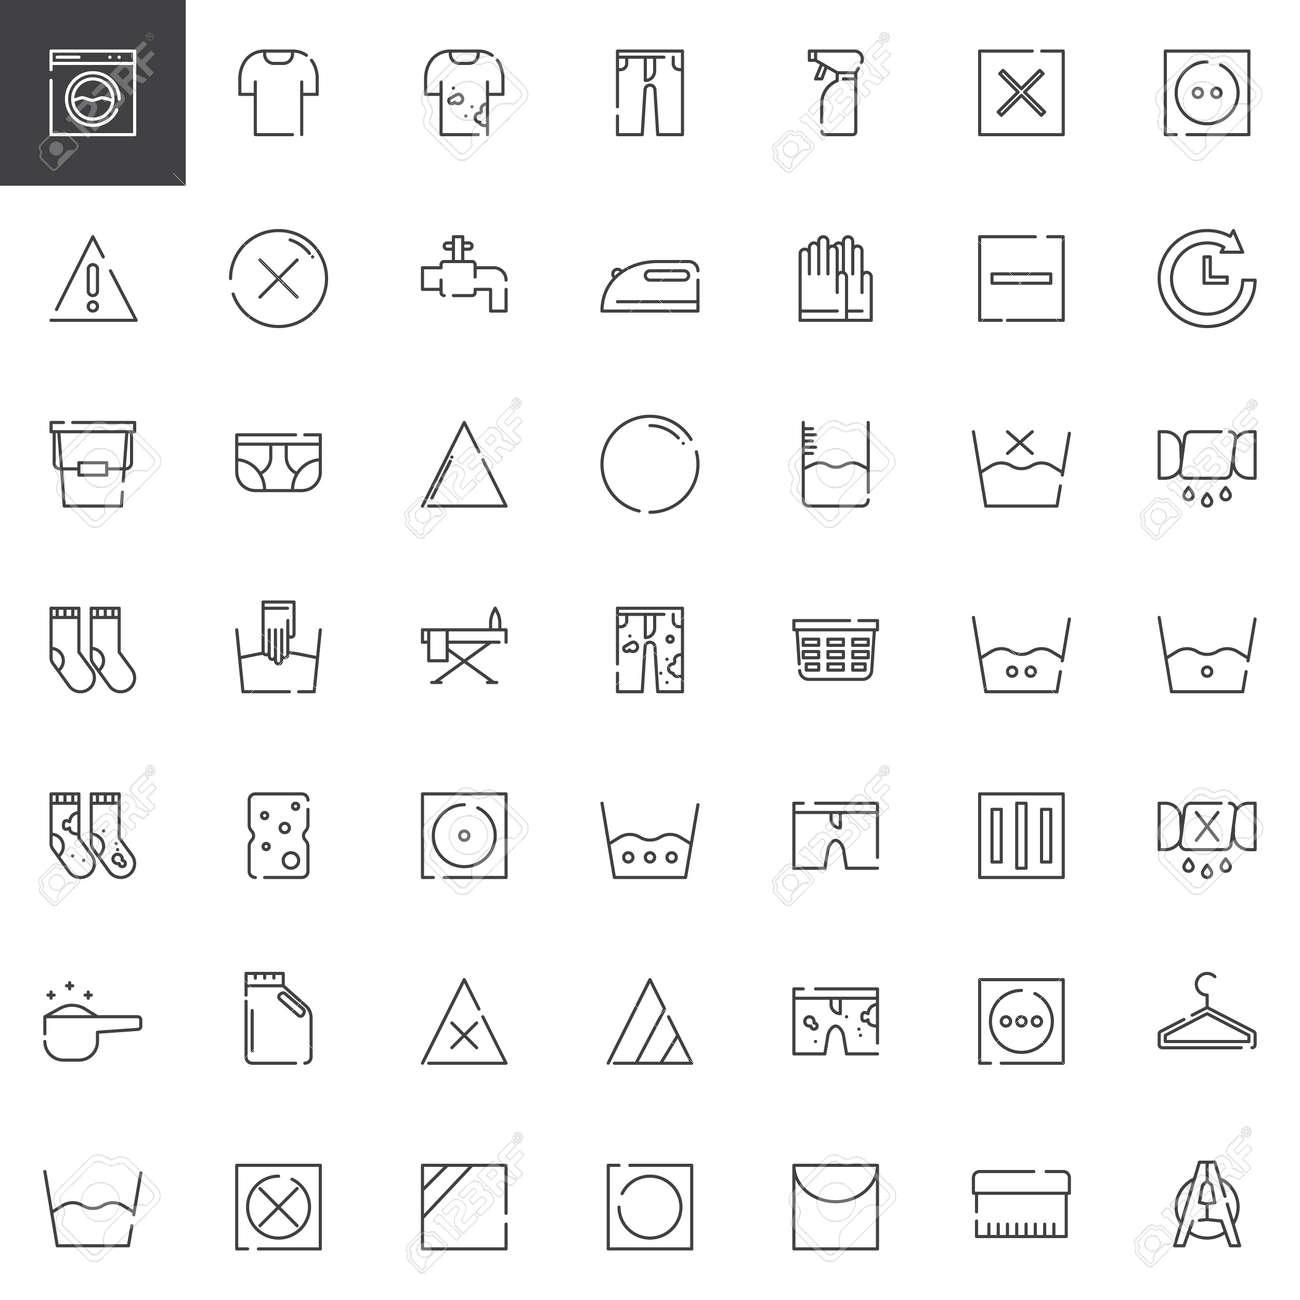 Laundry and dry cleaning line icons set outline vector symbol laundry and dry cleaning line icons set outline vector symbol collection linear style pictogram buycottarizona Choice Image